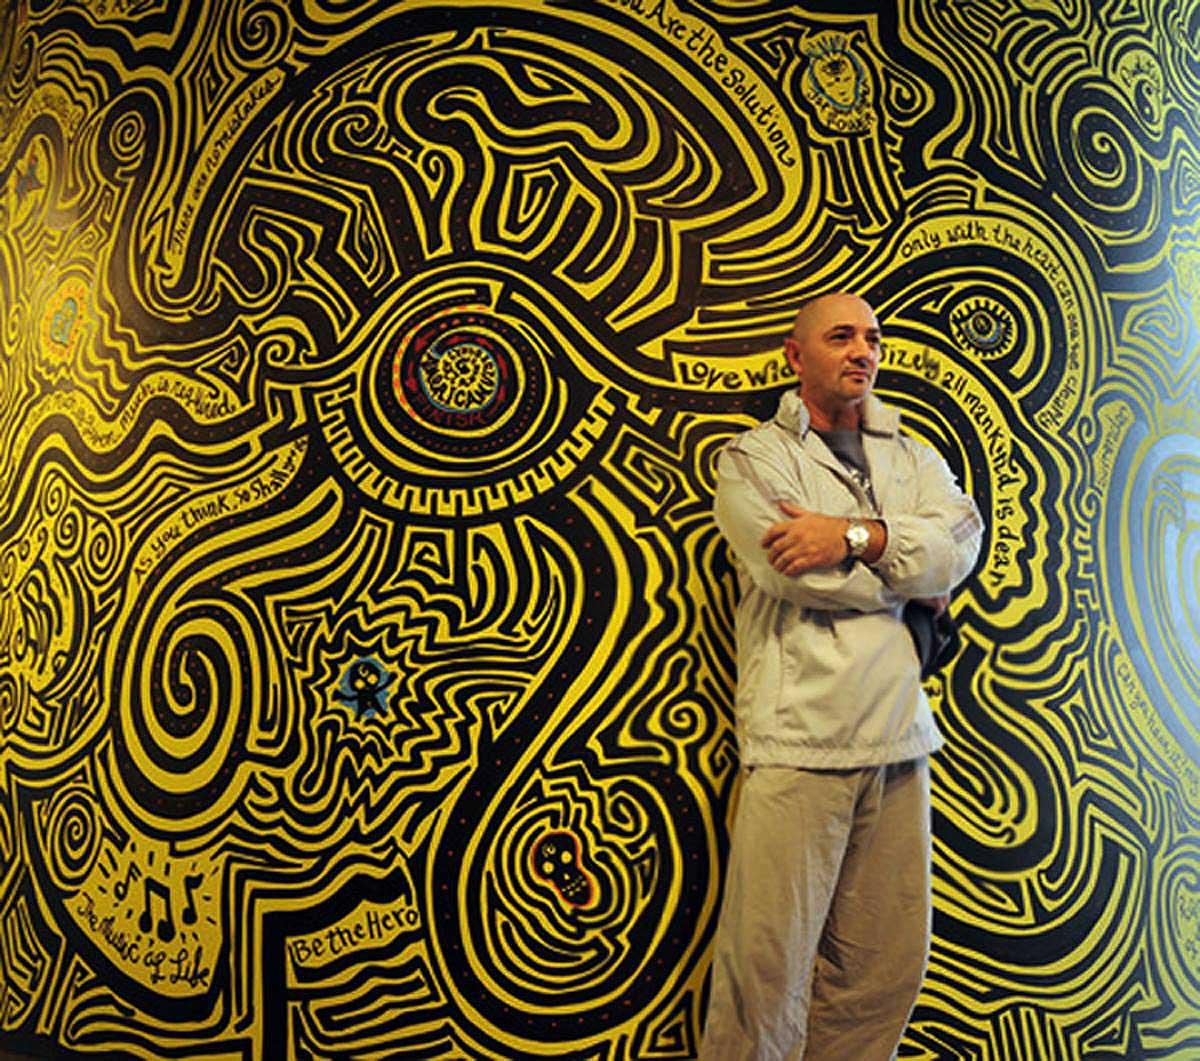 David Russo / Wall Maze / American Visionary Art Museum